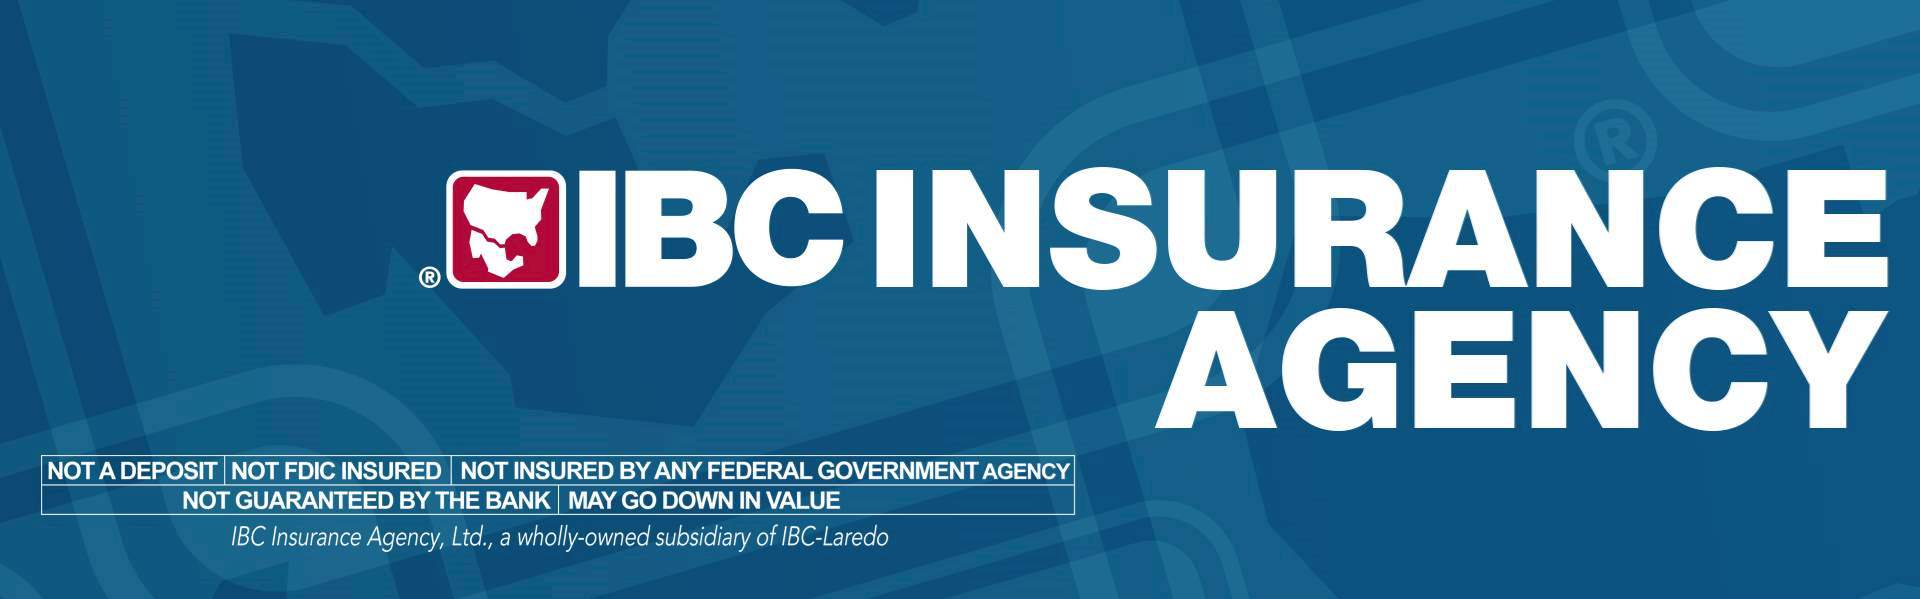 IBC Insurance Agency